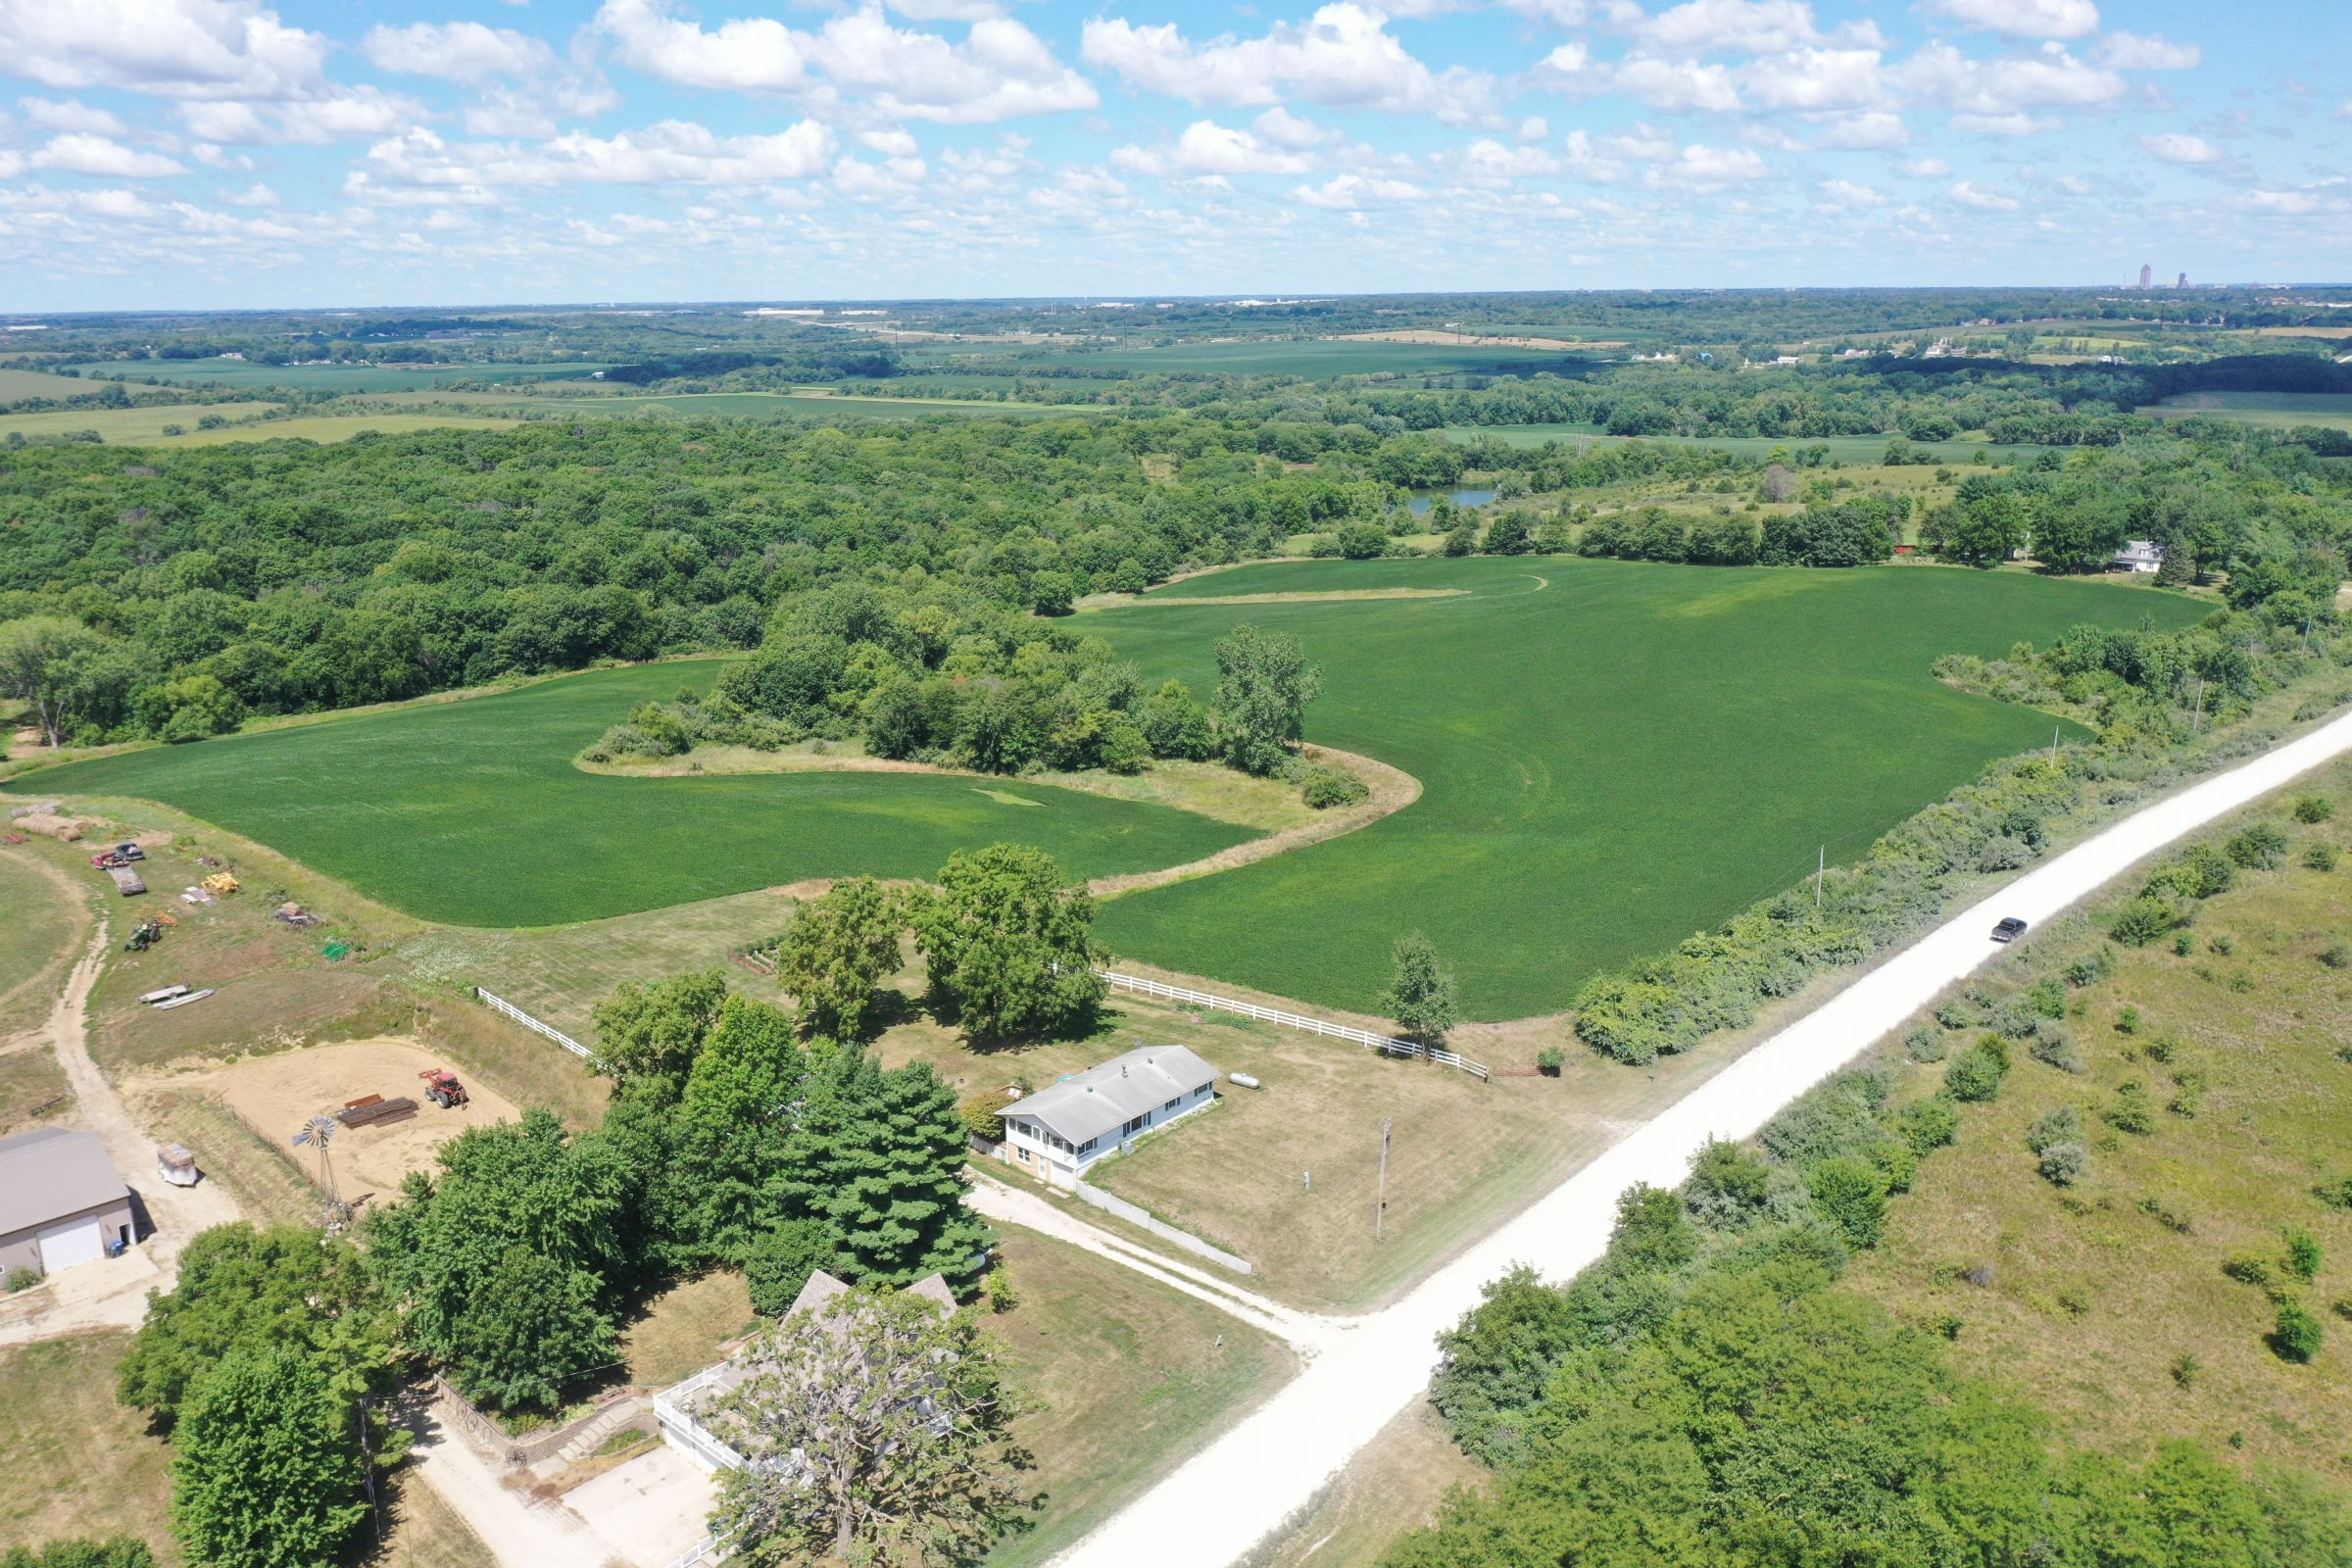 development-land-warren-county-iowa-38-acres-listing-number-15513-0-2021-05-06-172735.JPG